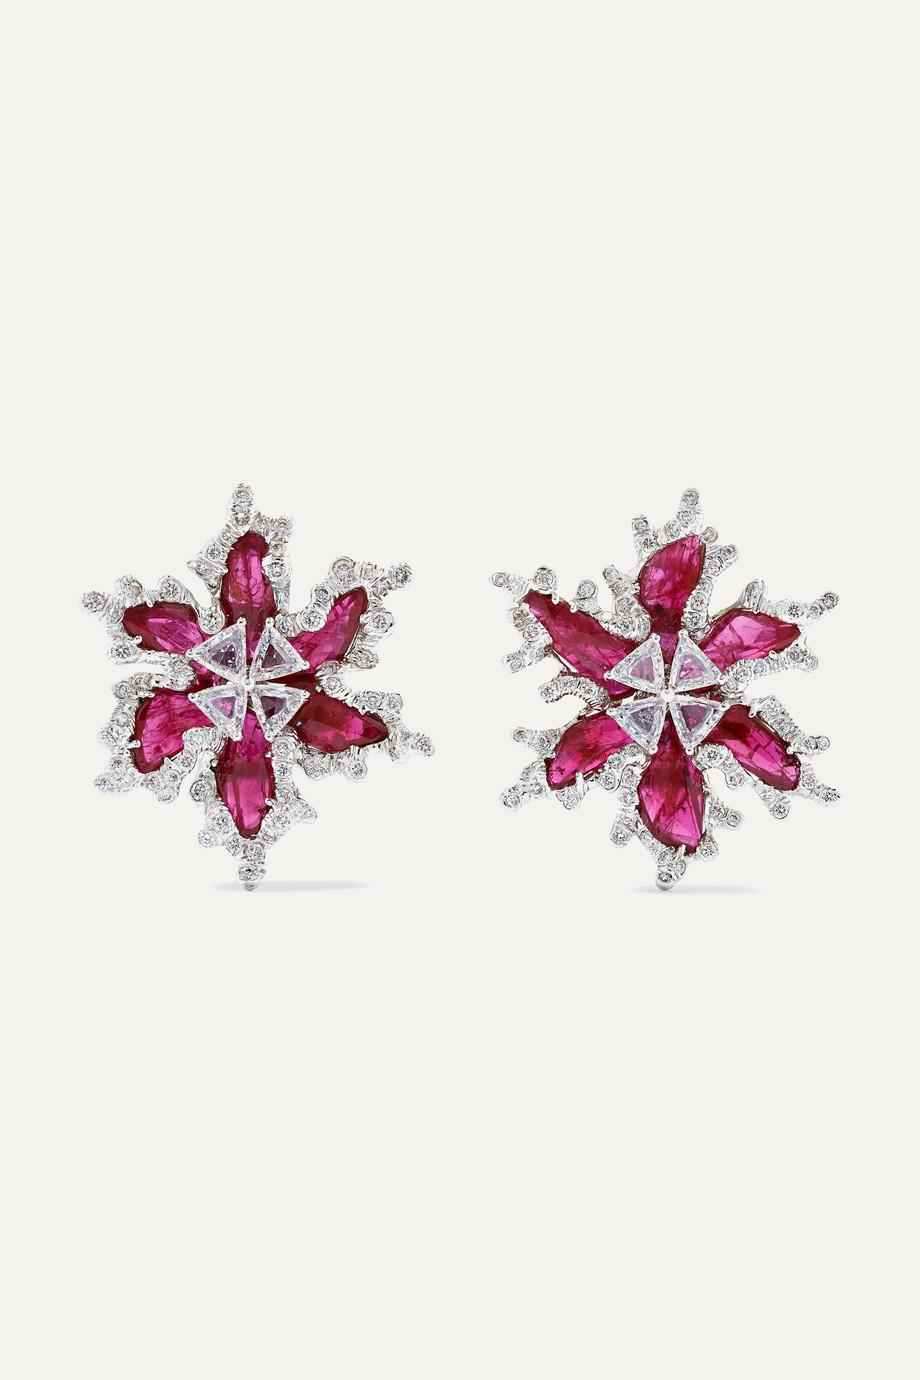 Bina Goenka 18-karat gold, diamond and ruby earrings